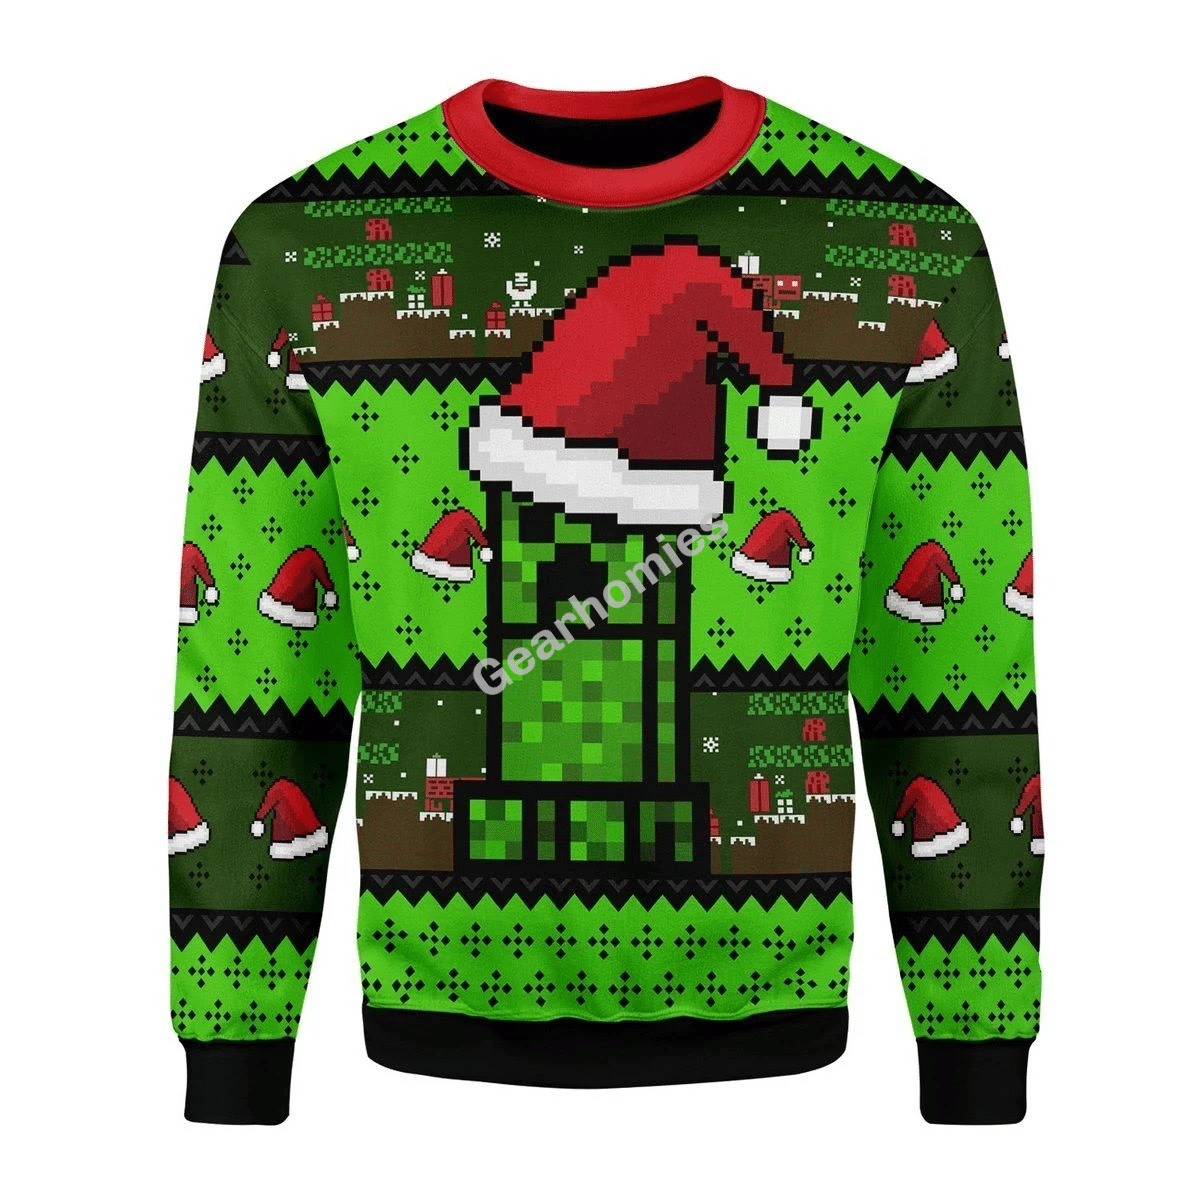 Merry Christmas Gearhomies Unisex Christmas Sweater Minecraft 3D Apparel